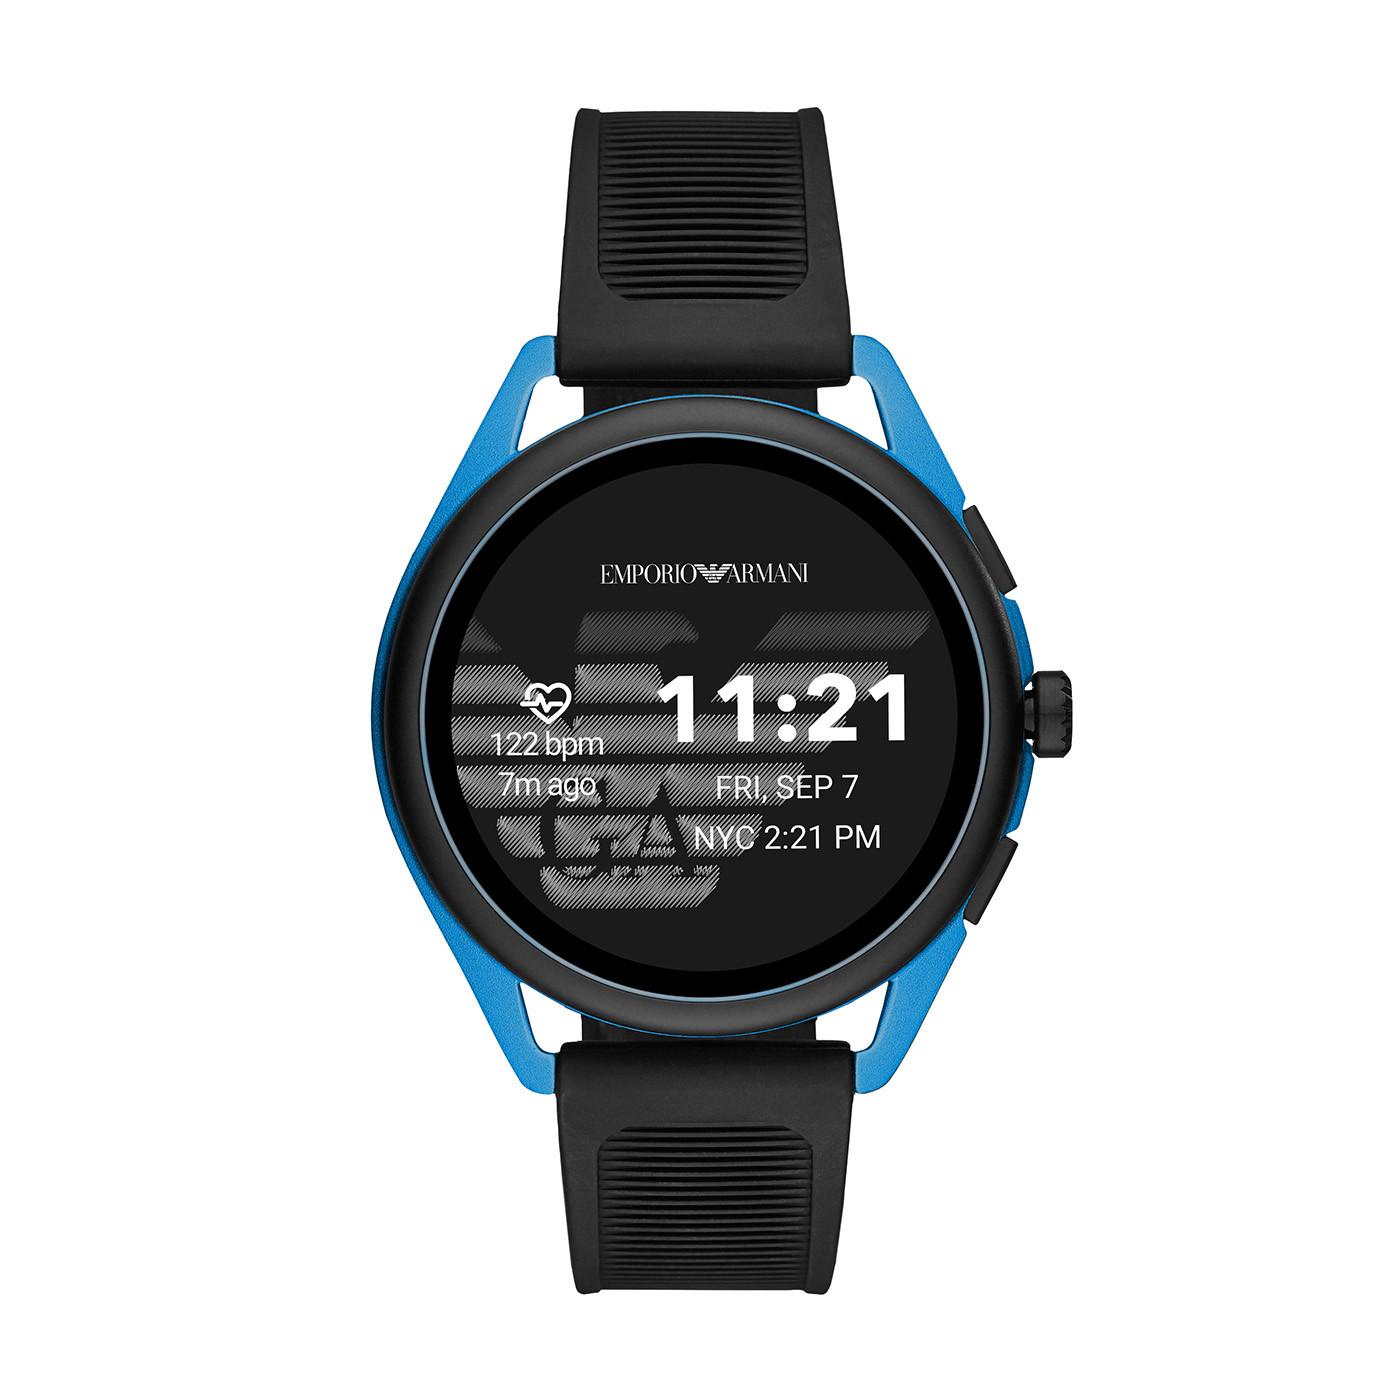 Emporio Armani Connected Matteo Gen 5 Display Smartwatch ART5024